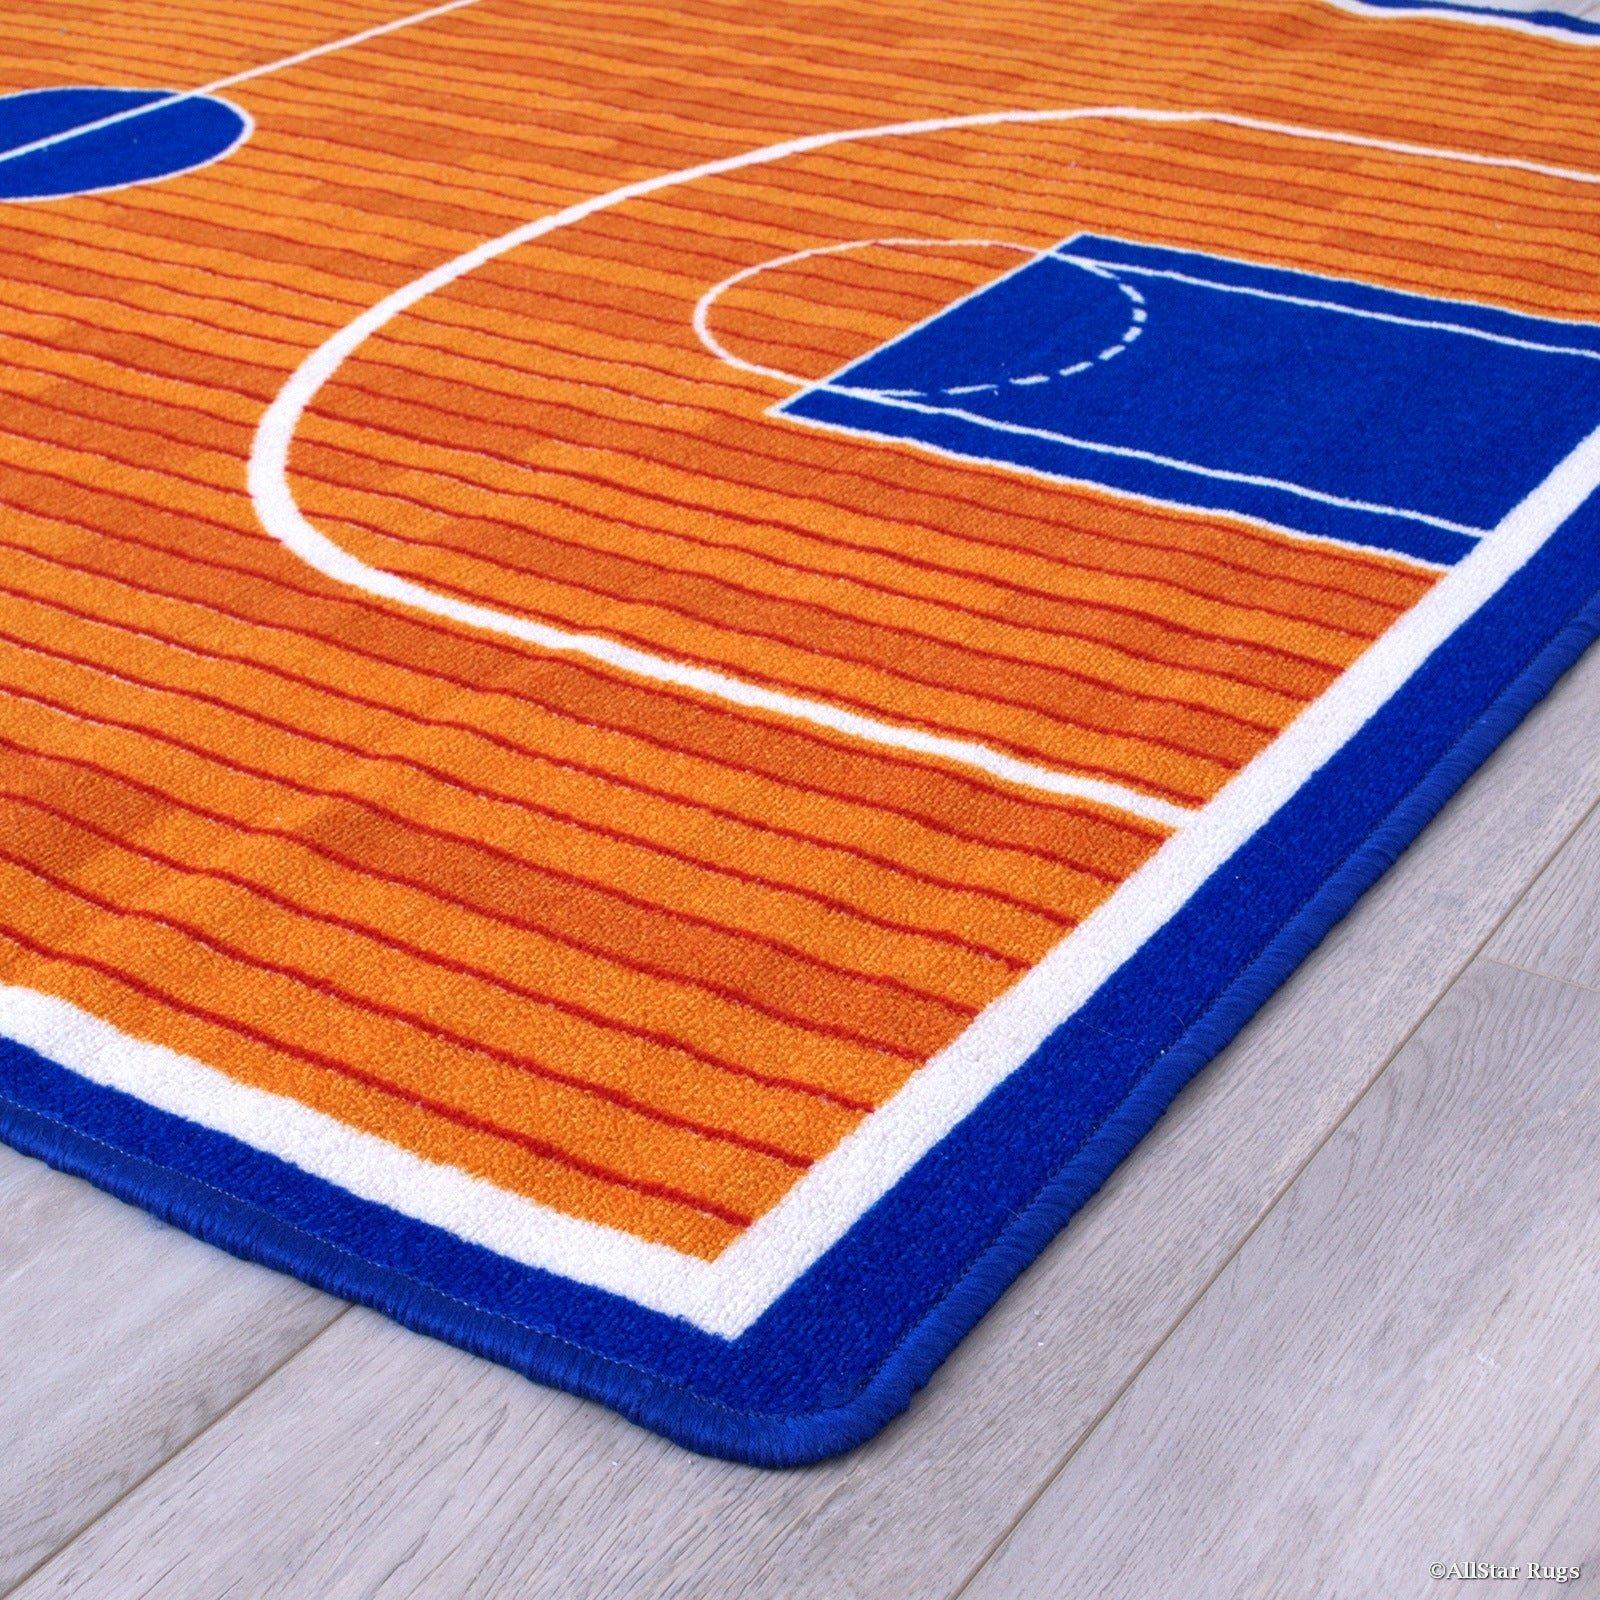 Basketball Half Court Rug Lovely Basketball Half Court Rug Uniquely Modern Rugs